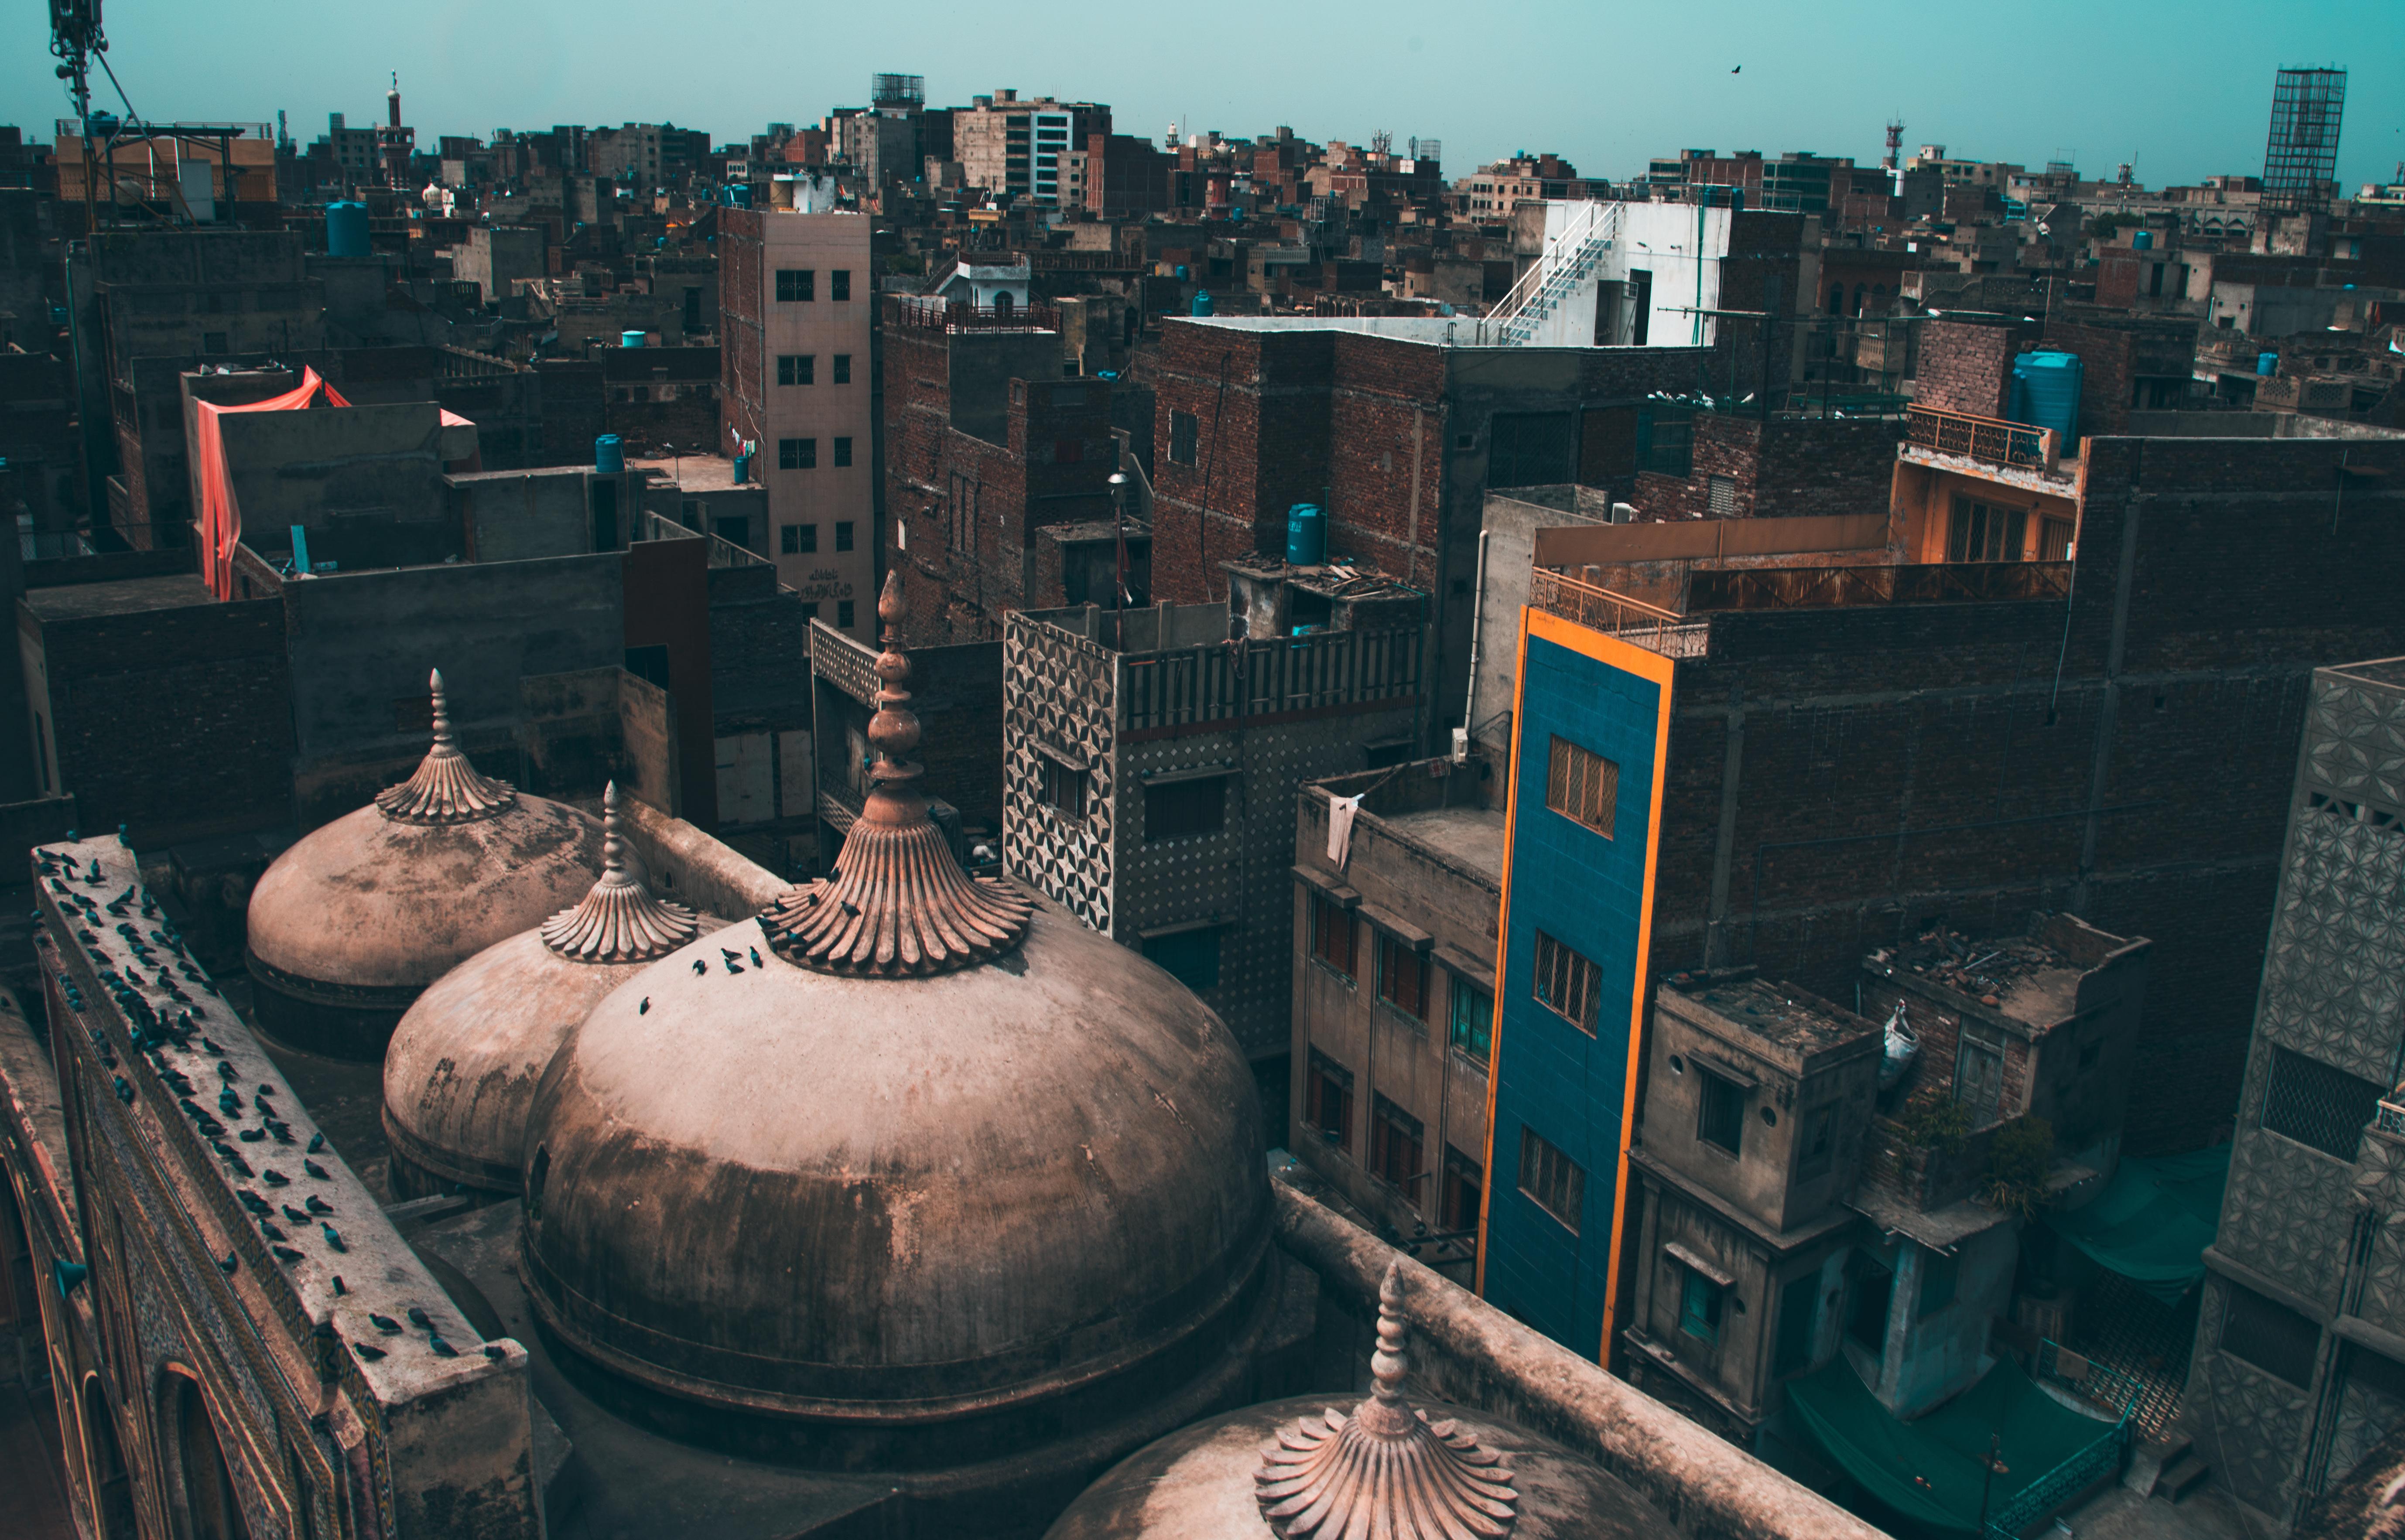 Lahore Nightlife - Heera Mandi (Red Light Area) | SmarterTravel